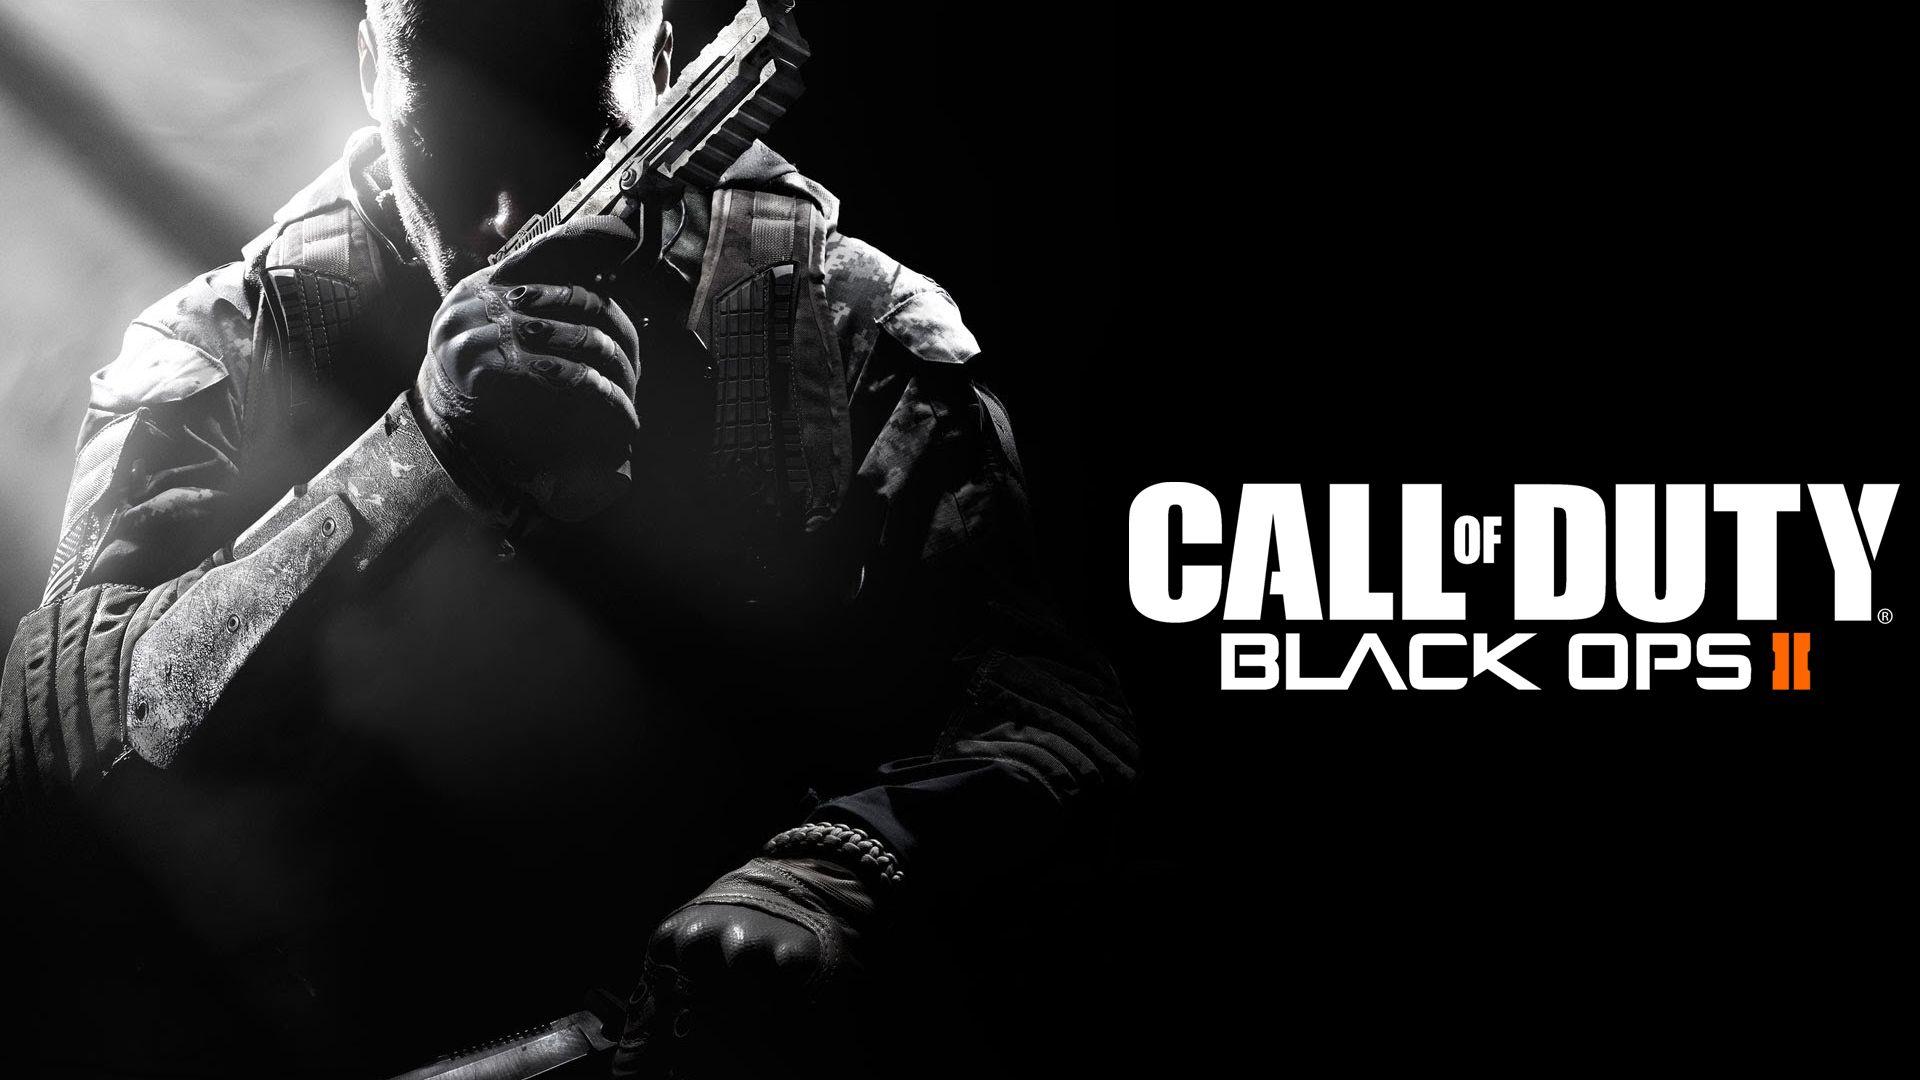 call of duty black ops wallpaper 1920x1080